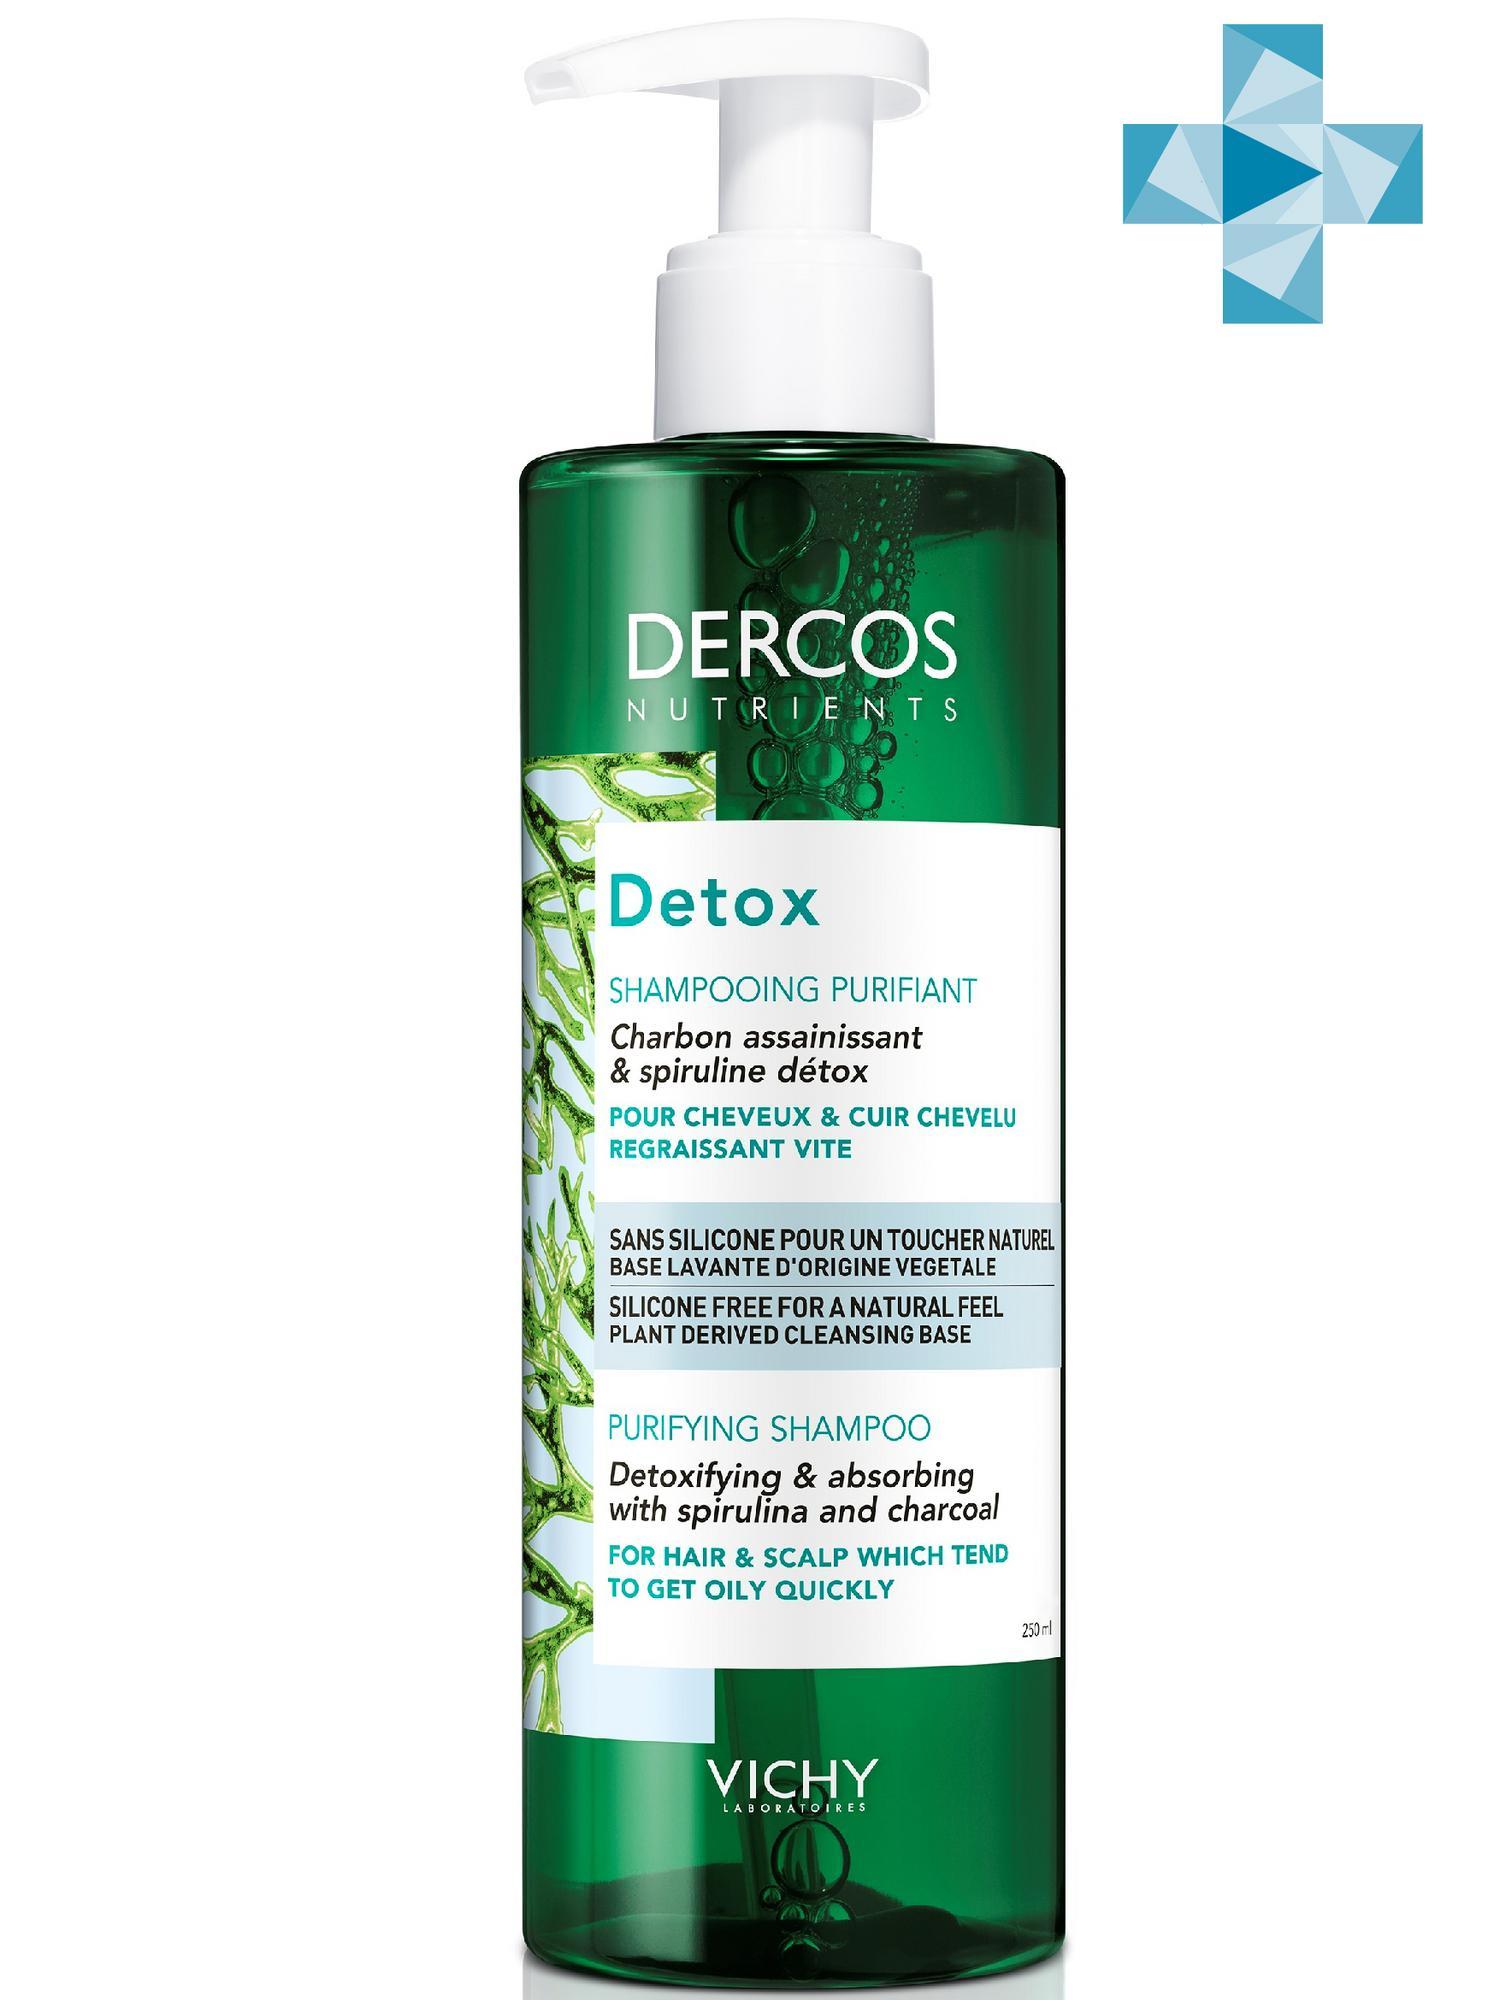 Vichy Detox Глубоко очищающий шампунь Dercos Nutrients 250 мл (Vichy, Dercos Nutrients)